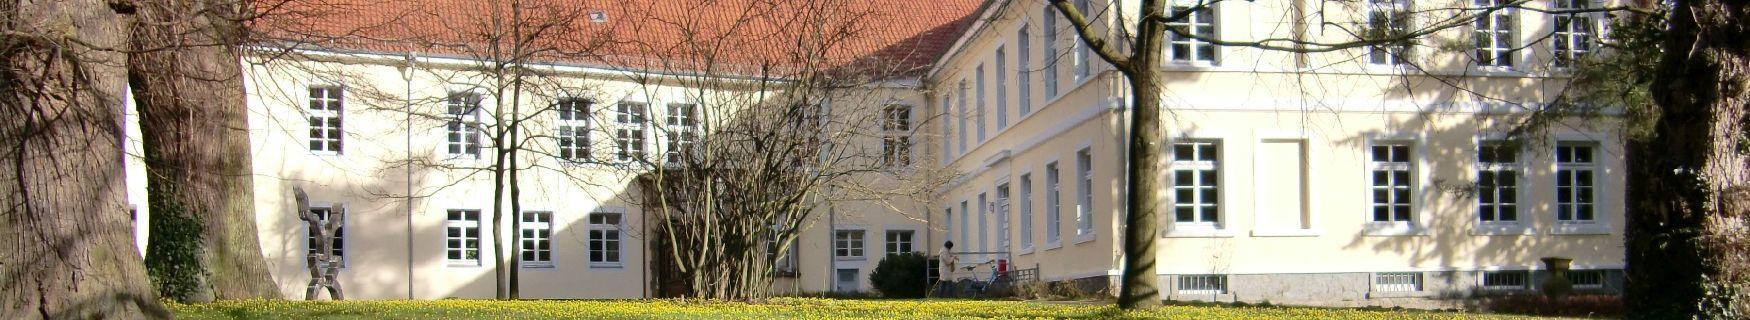 Rathaus Folgeseite